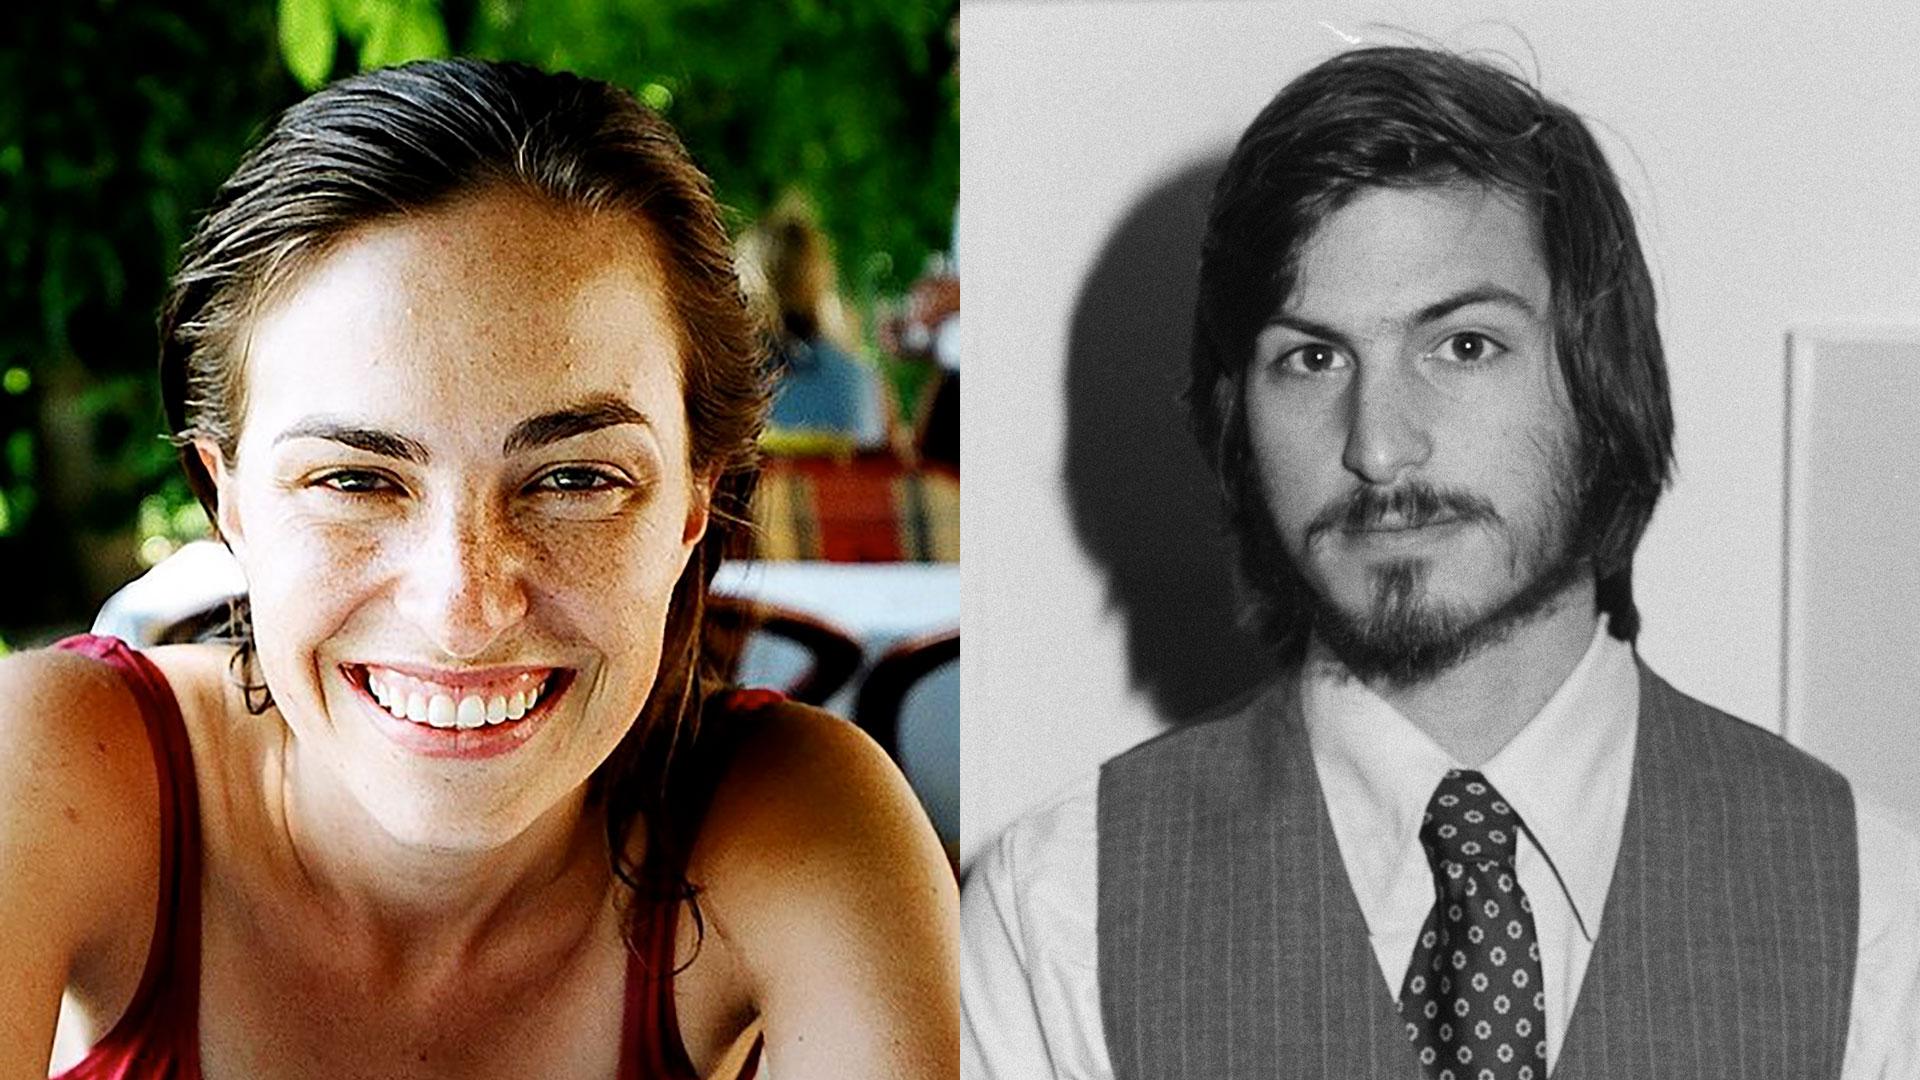 b59c218f57d The Real Story Behind Steve Jobs & His Daughter Lisa Brennan-Jobs ...